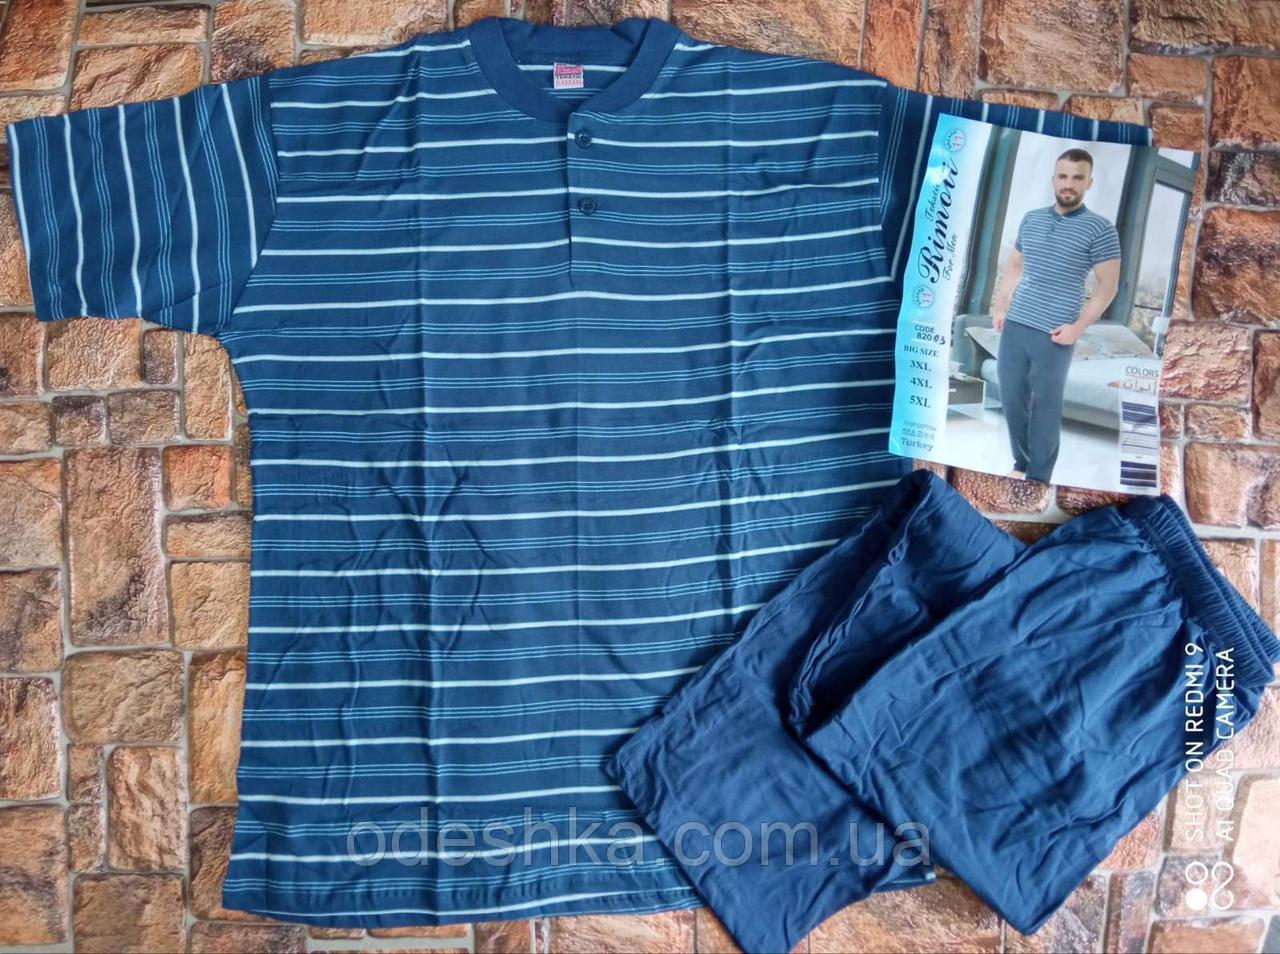 Трикотажная мужская пижама футболка с шортами